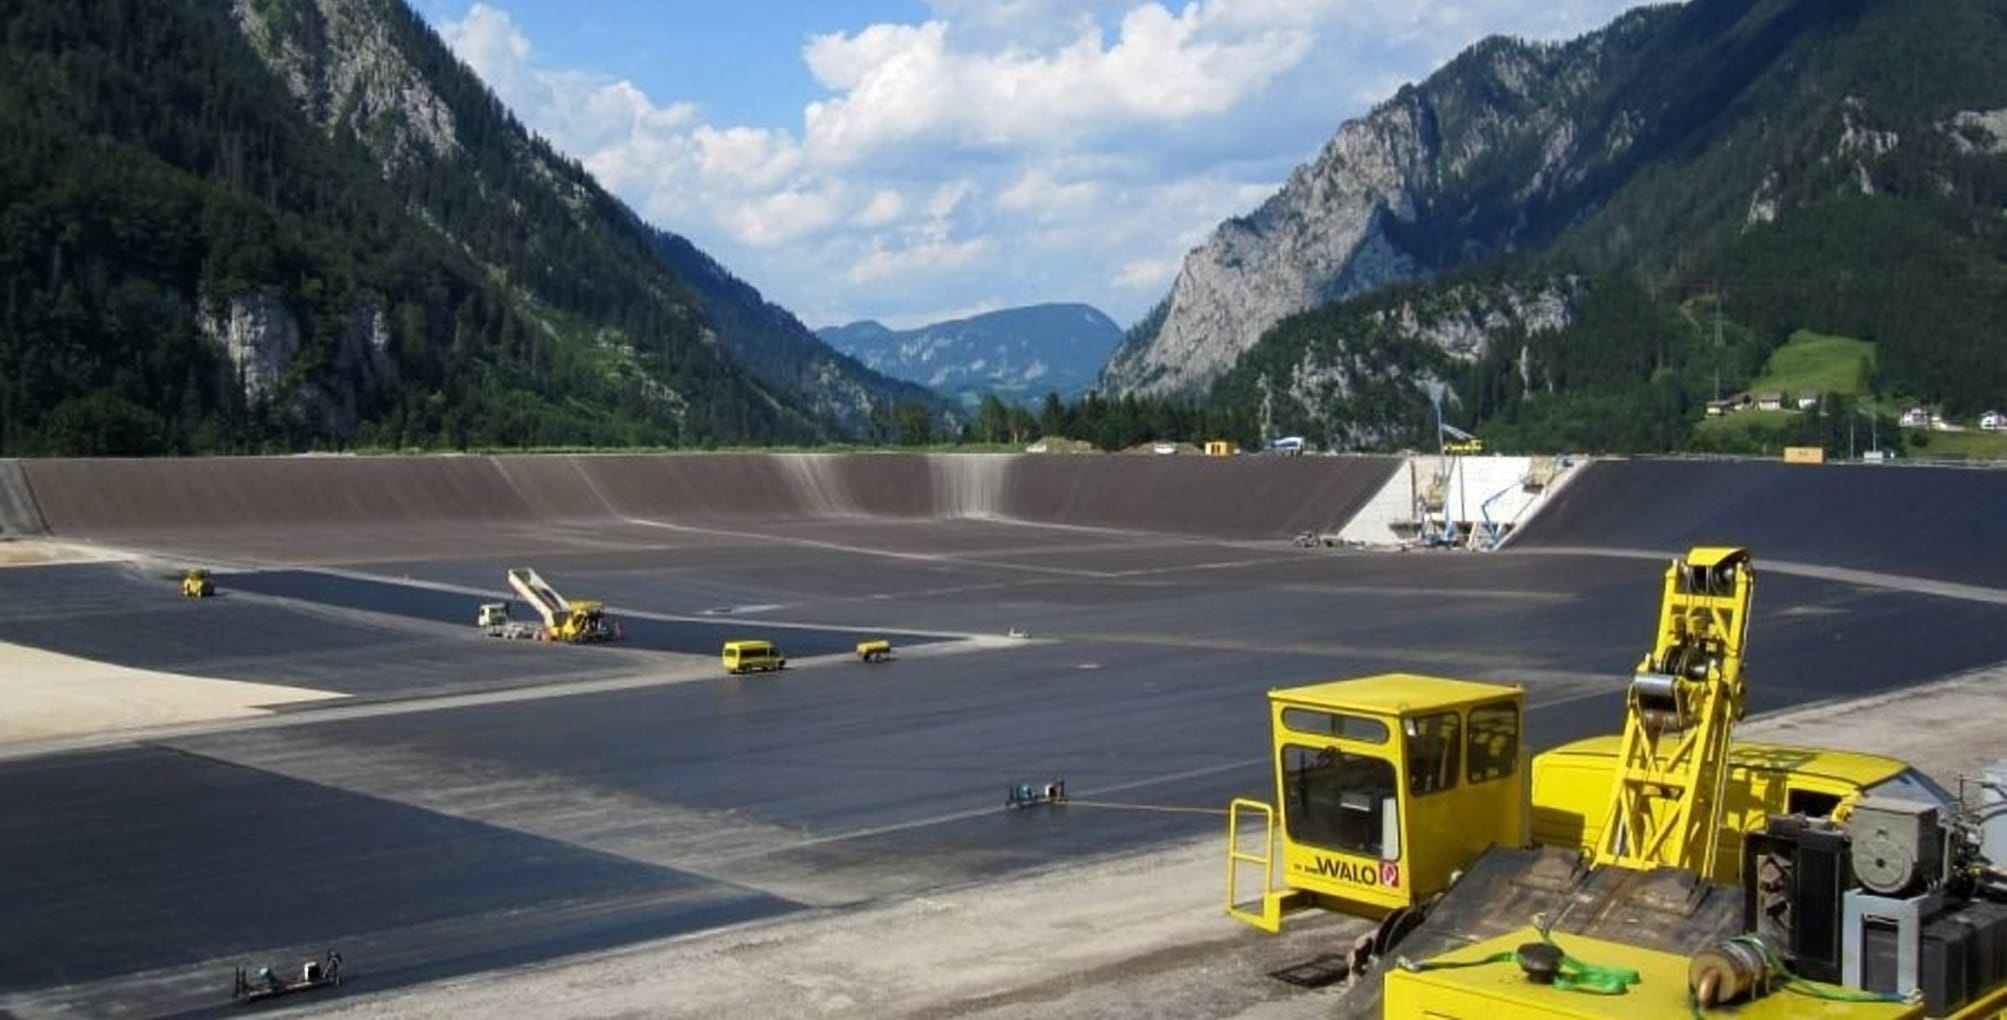 Case Study: Wag Reservoir, Austria